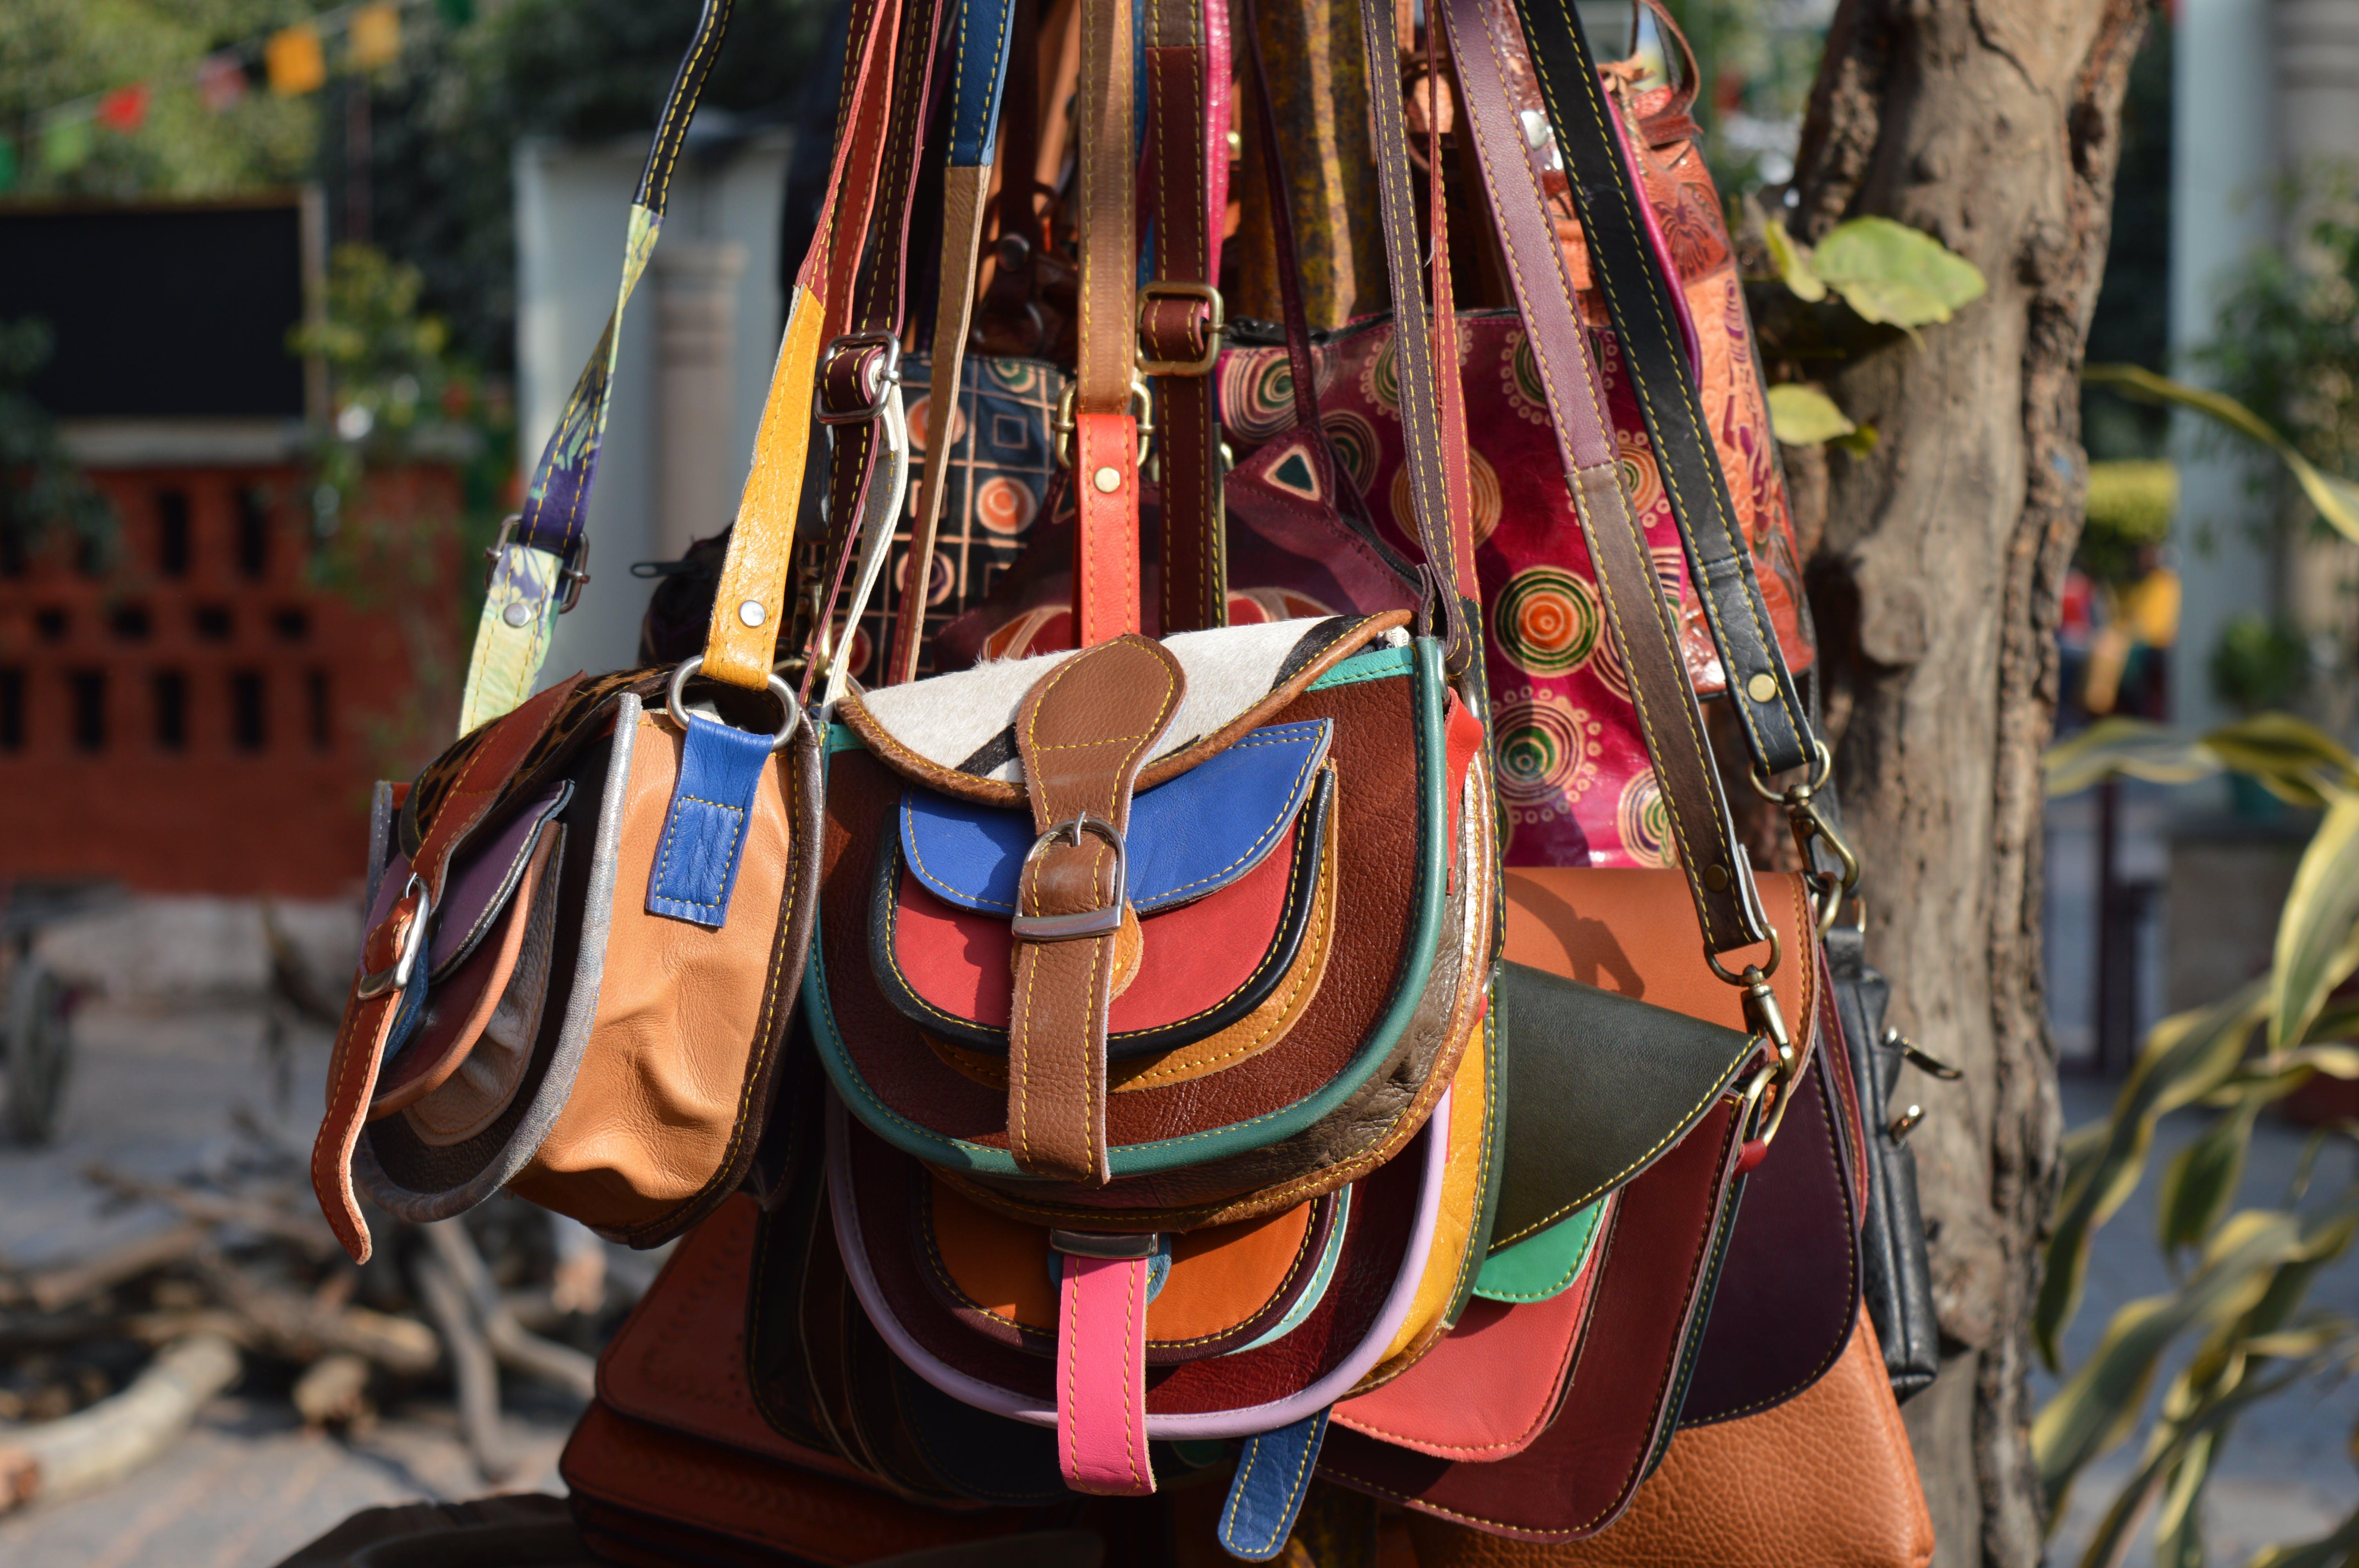 Free stock photo of carrybag, fashion, fashionable, leather